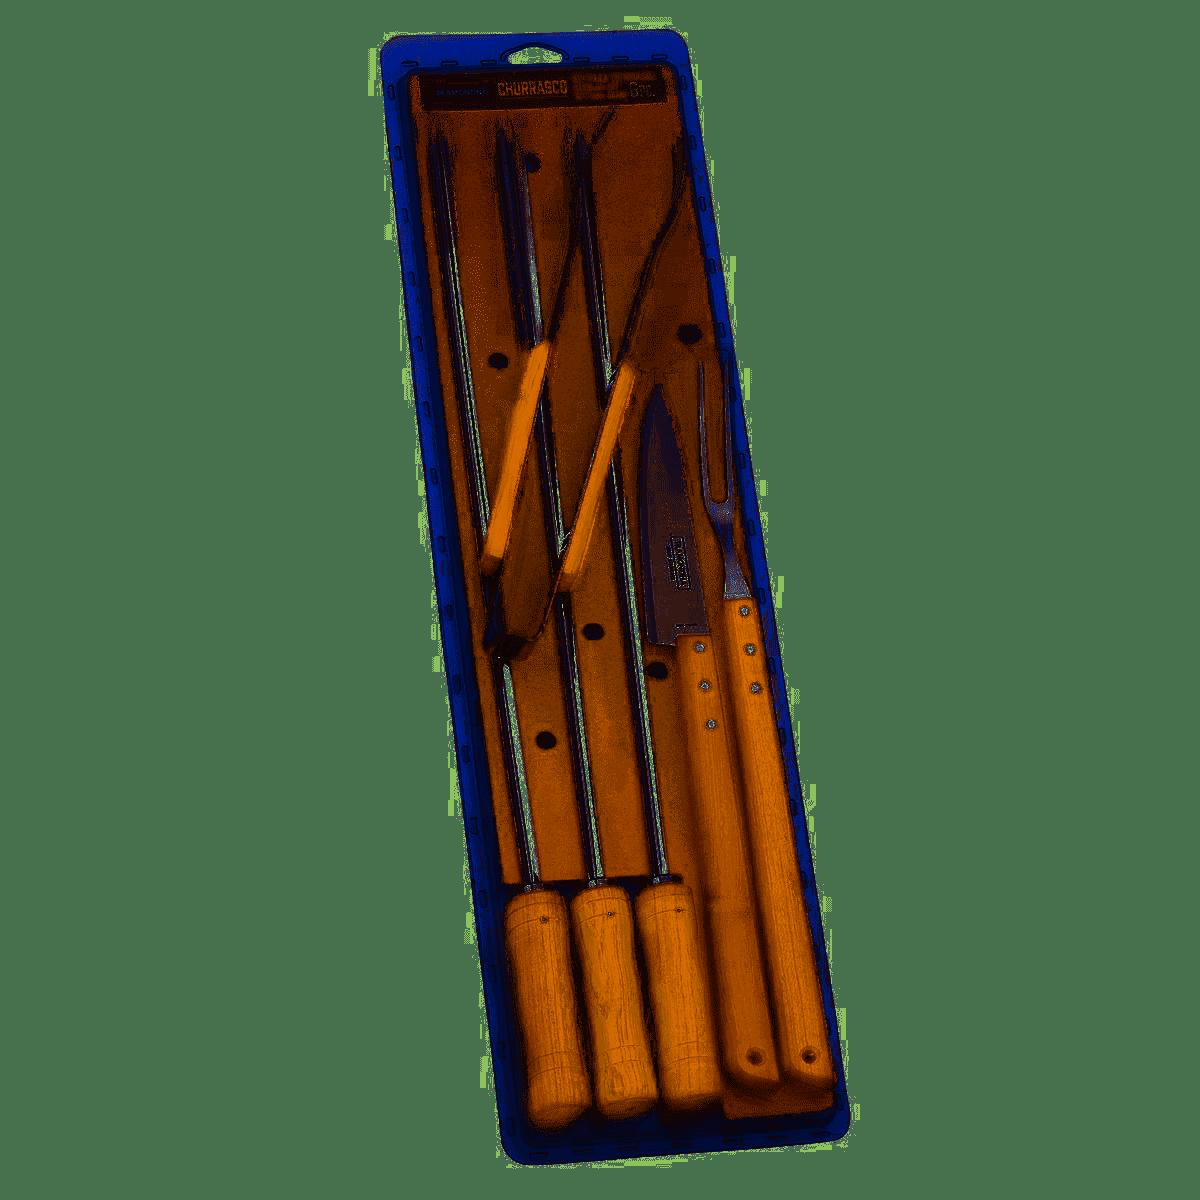 Conjunto Churrasco Inox 6 Peças Tramontina Ref 26499/026